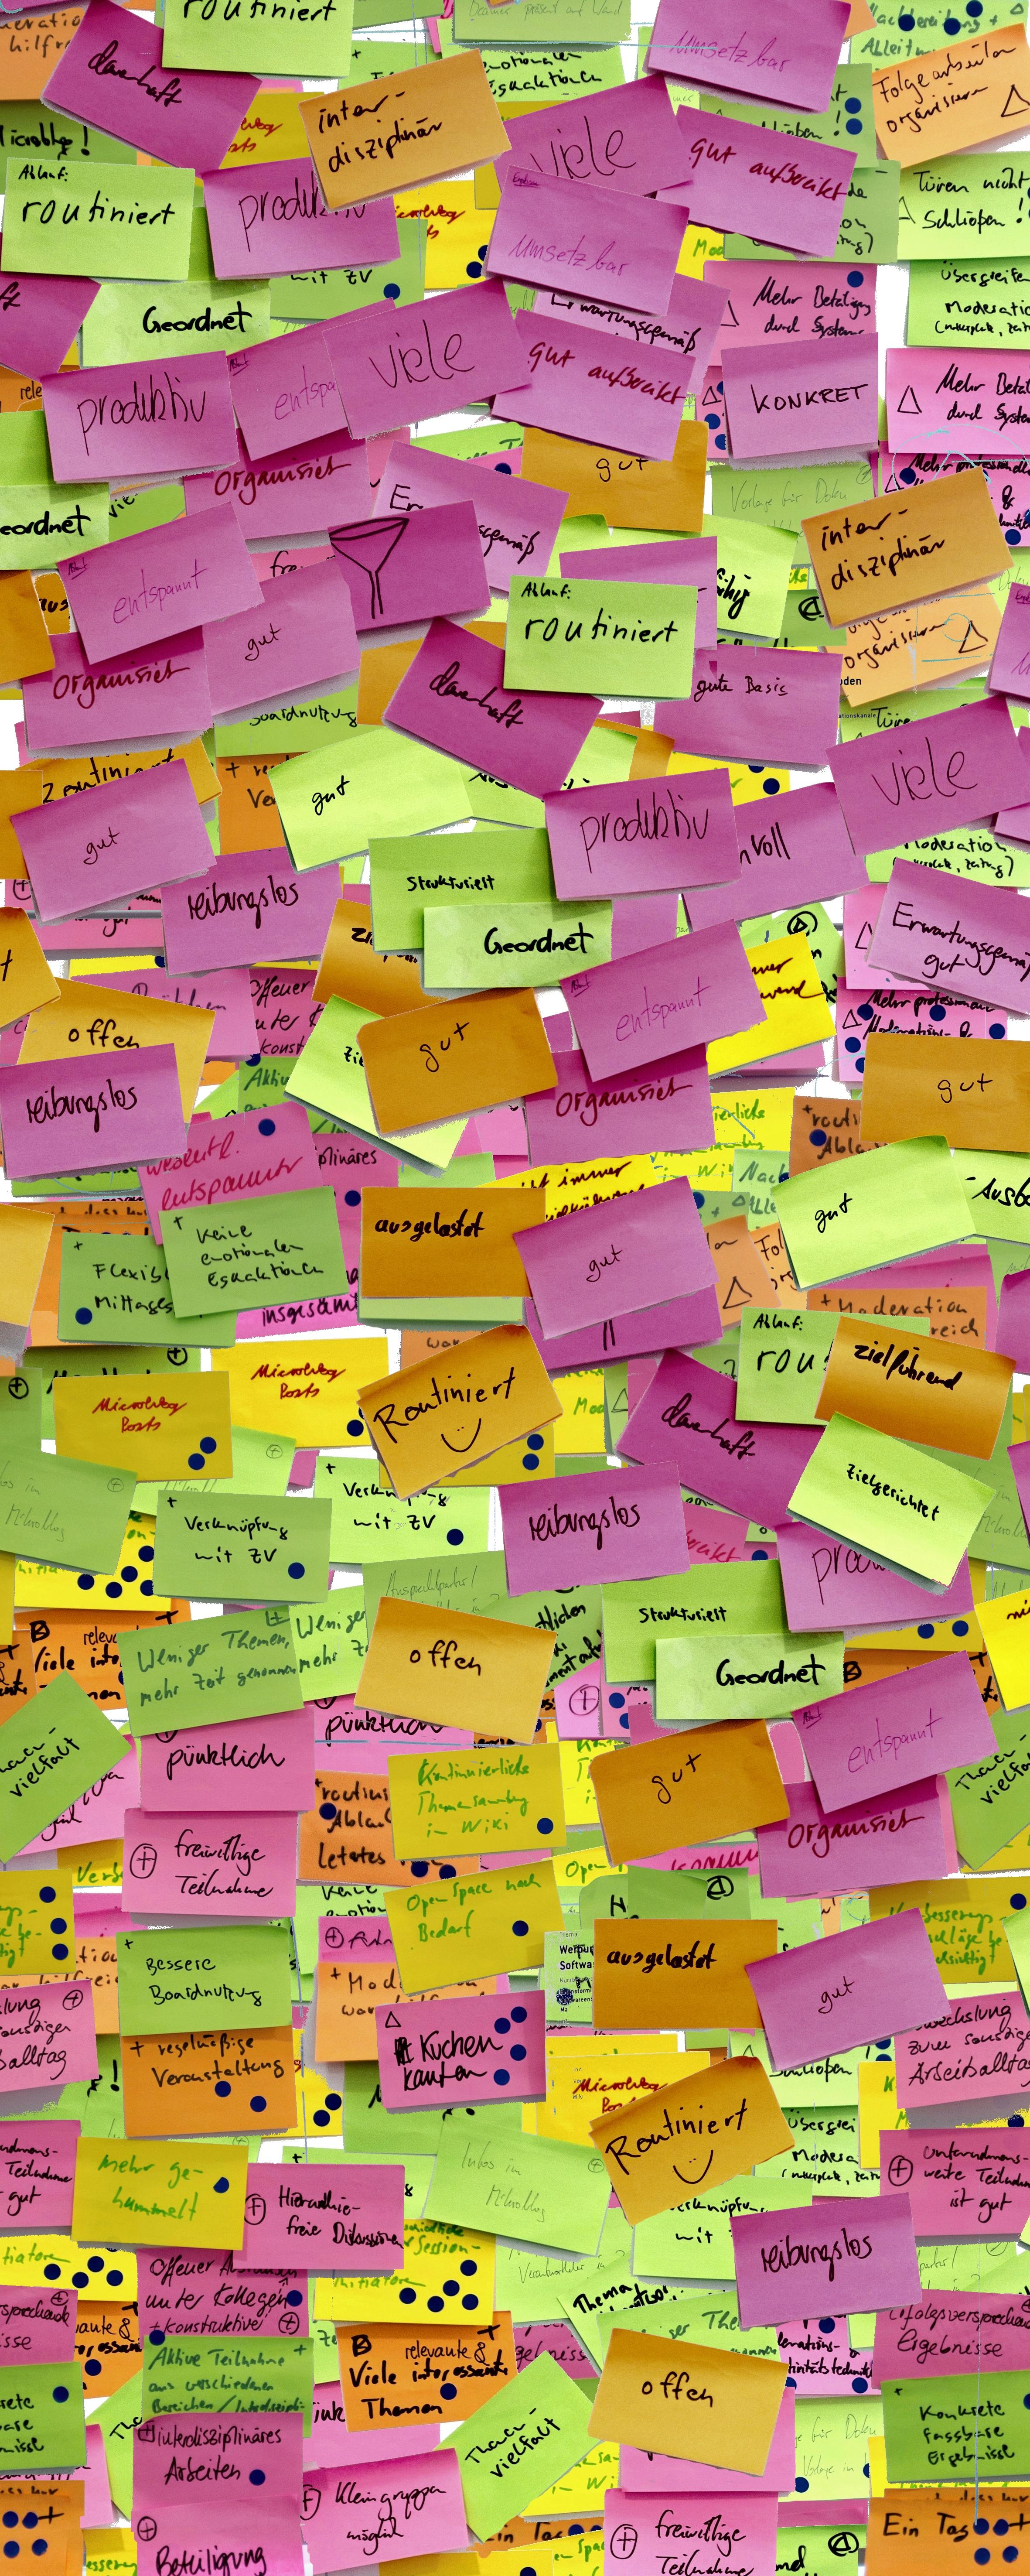 jseibert brainstorming_overload